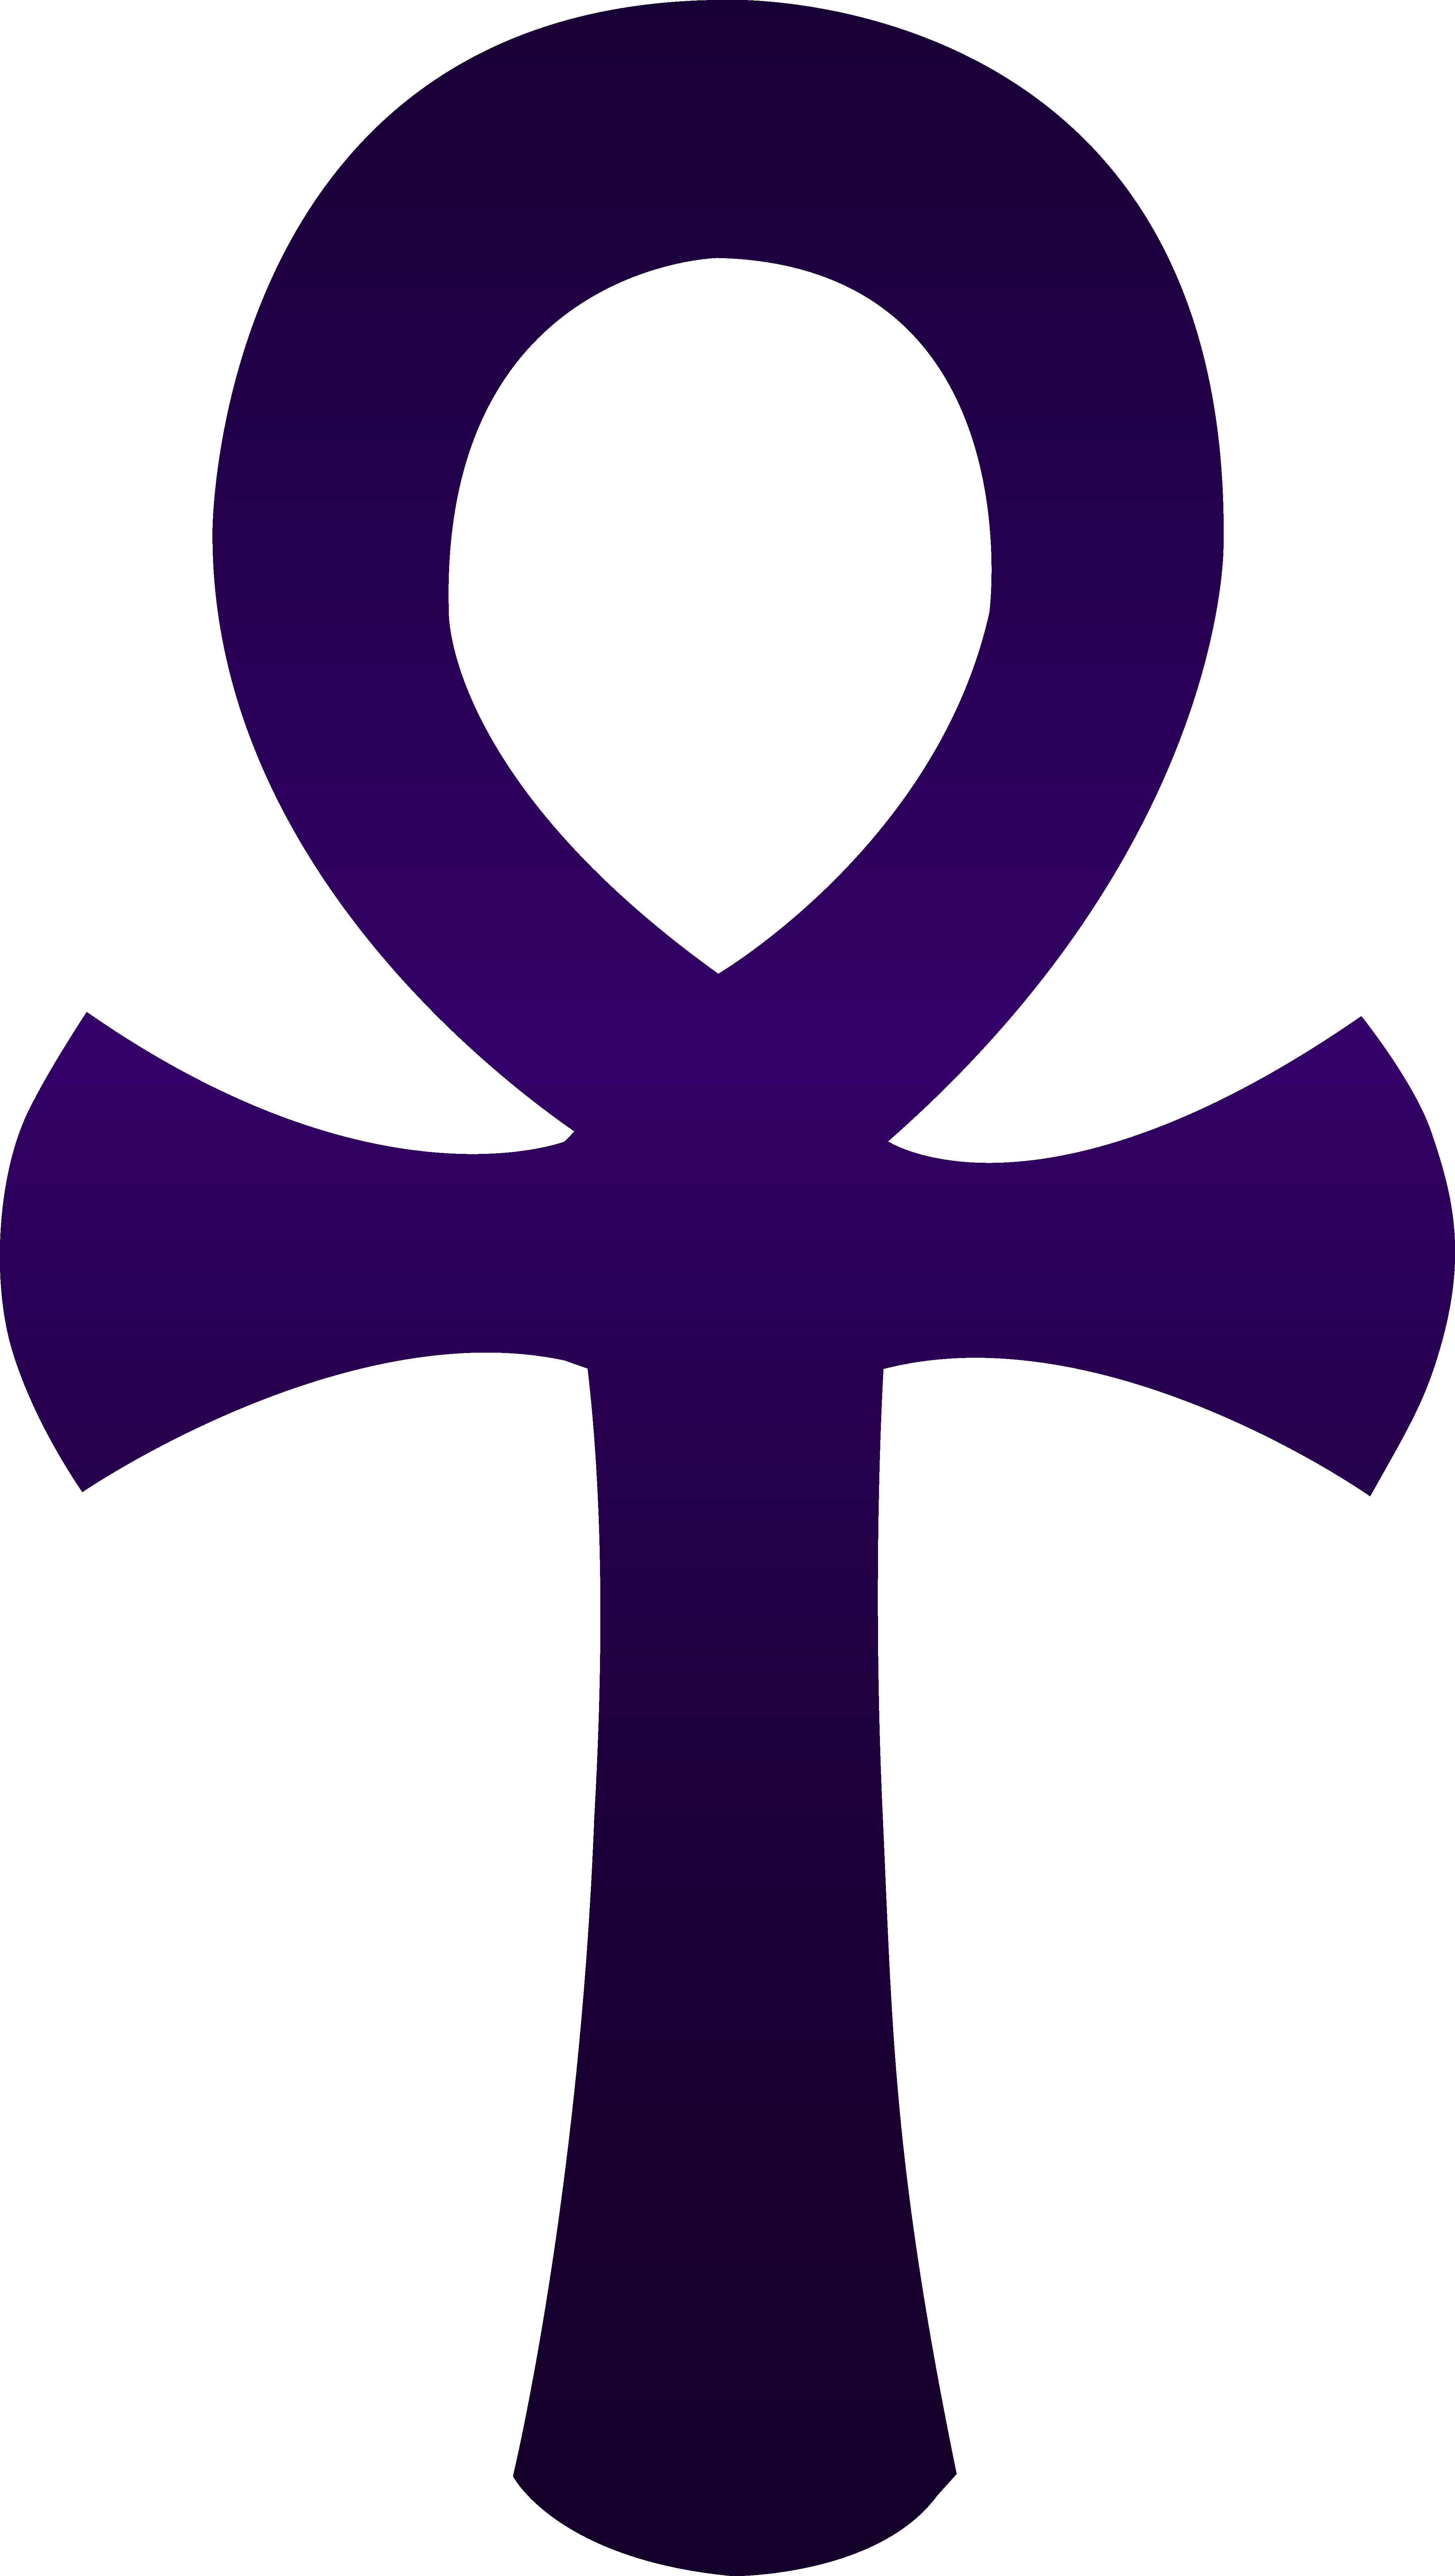 Violet egyptian ankh symbol. Egypt clipart africa ancient